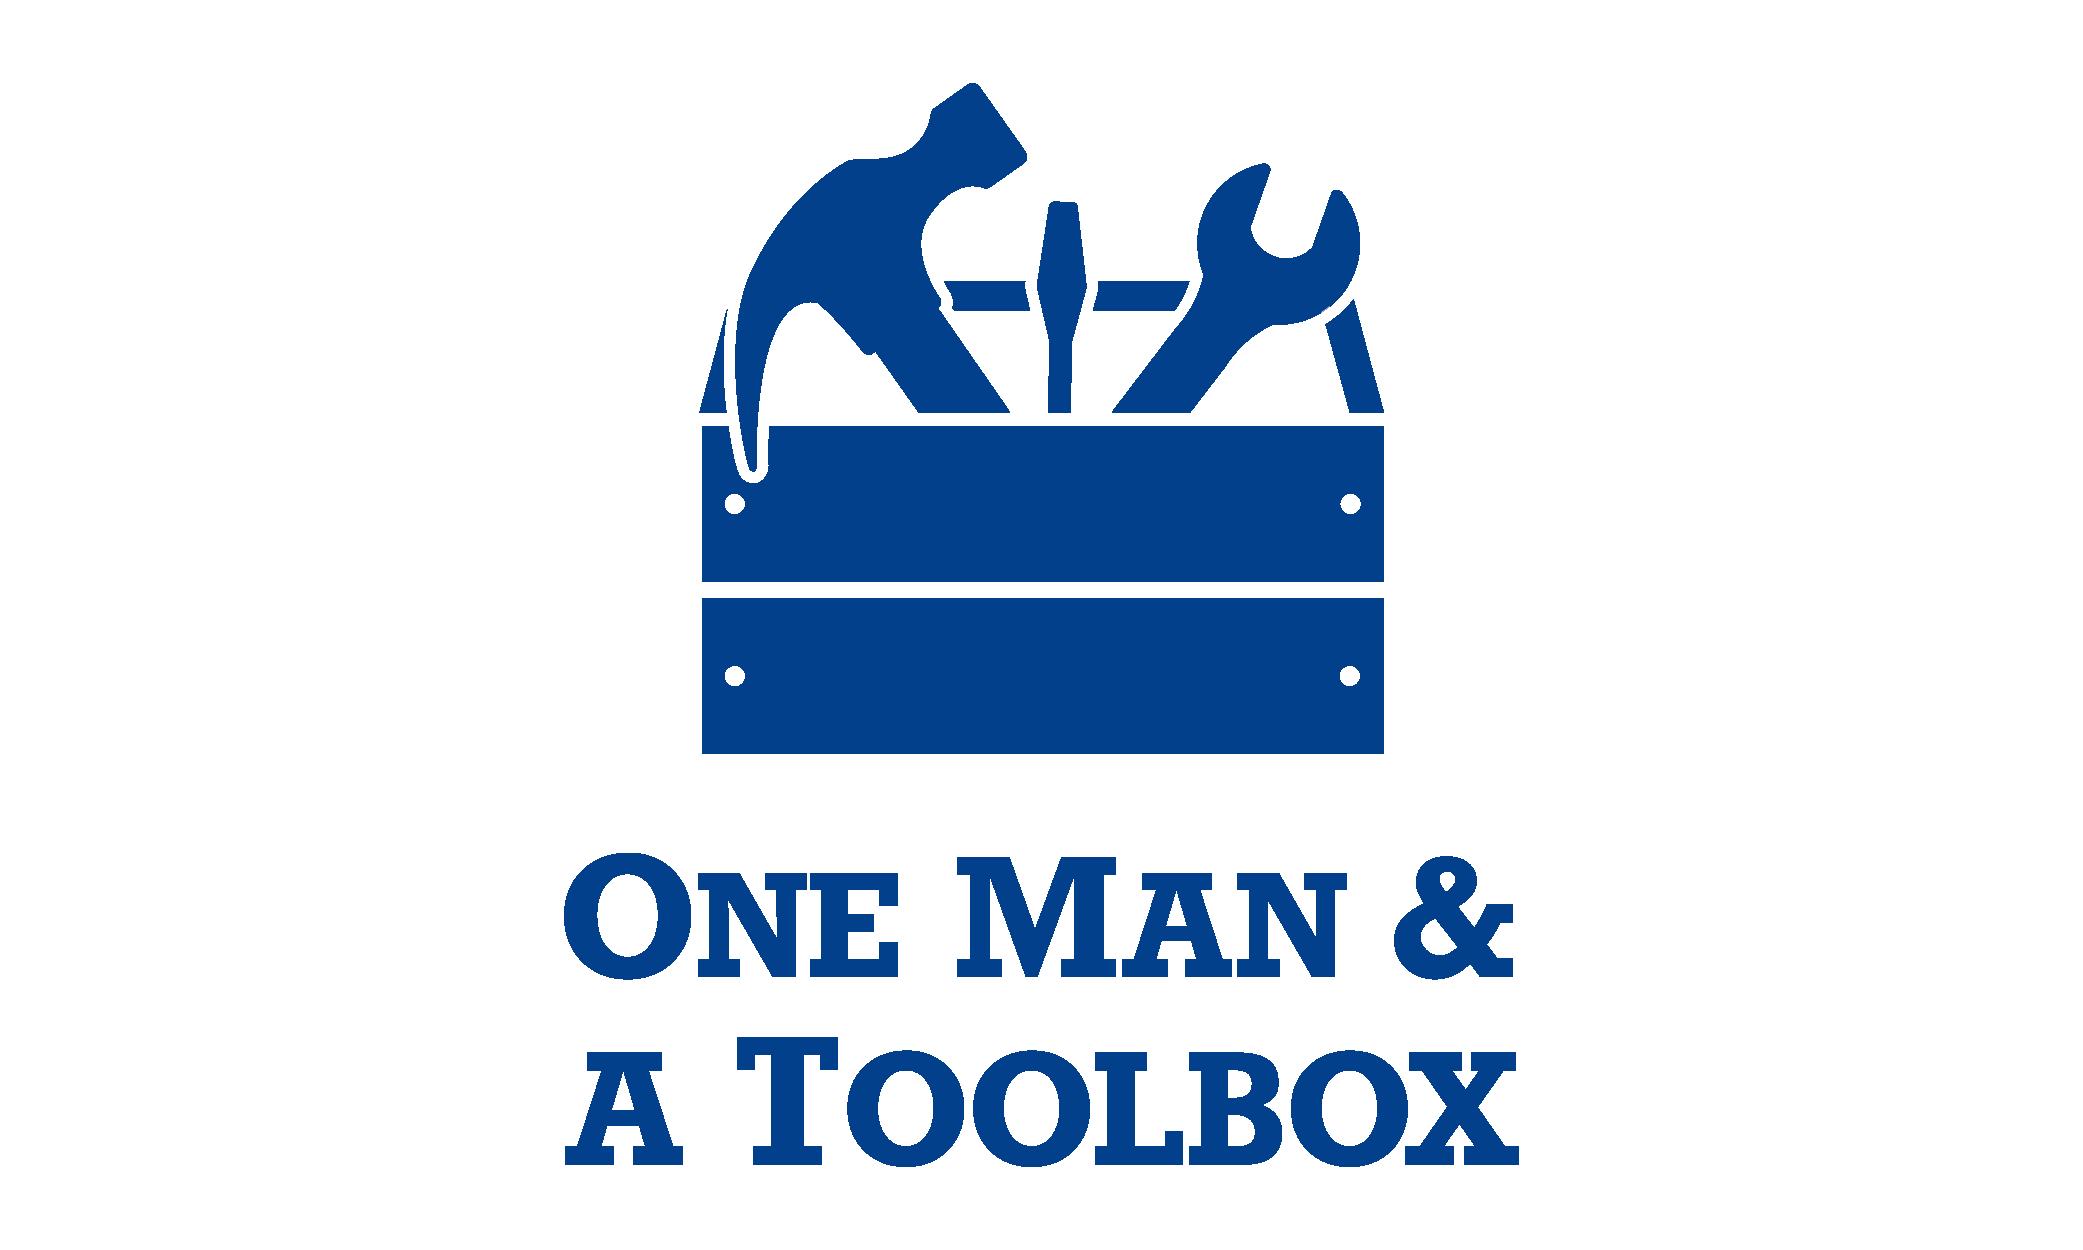 One Man and A Toolbox Logo Emily VanderMey